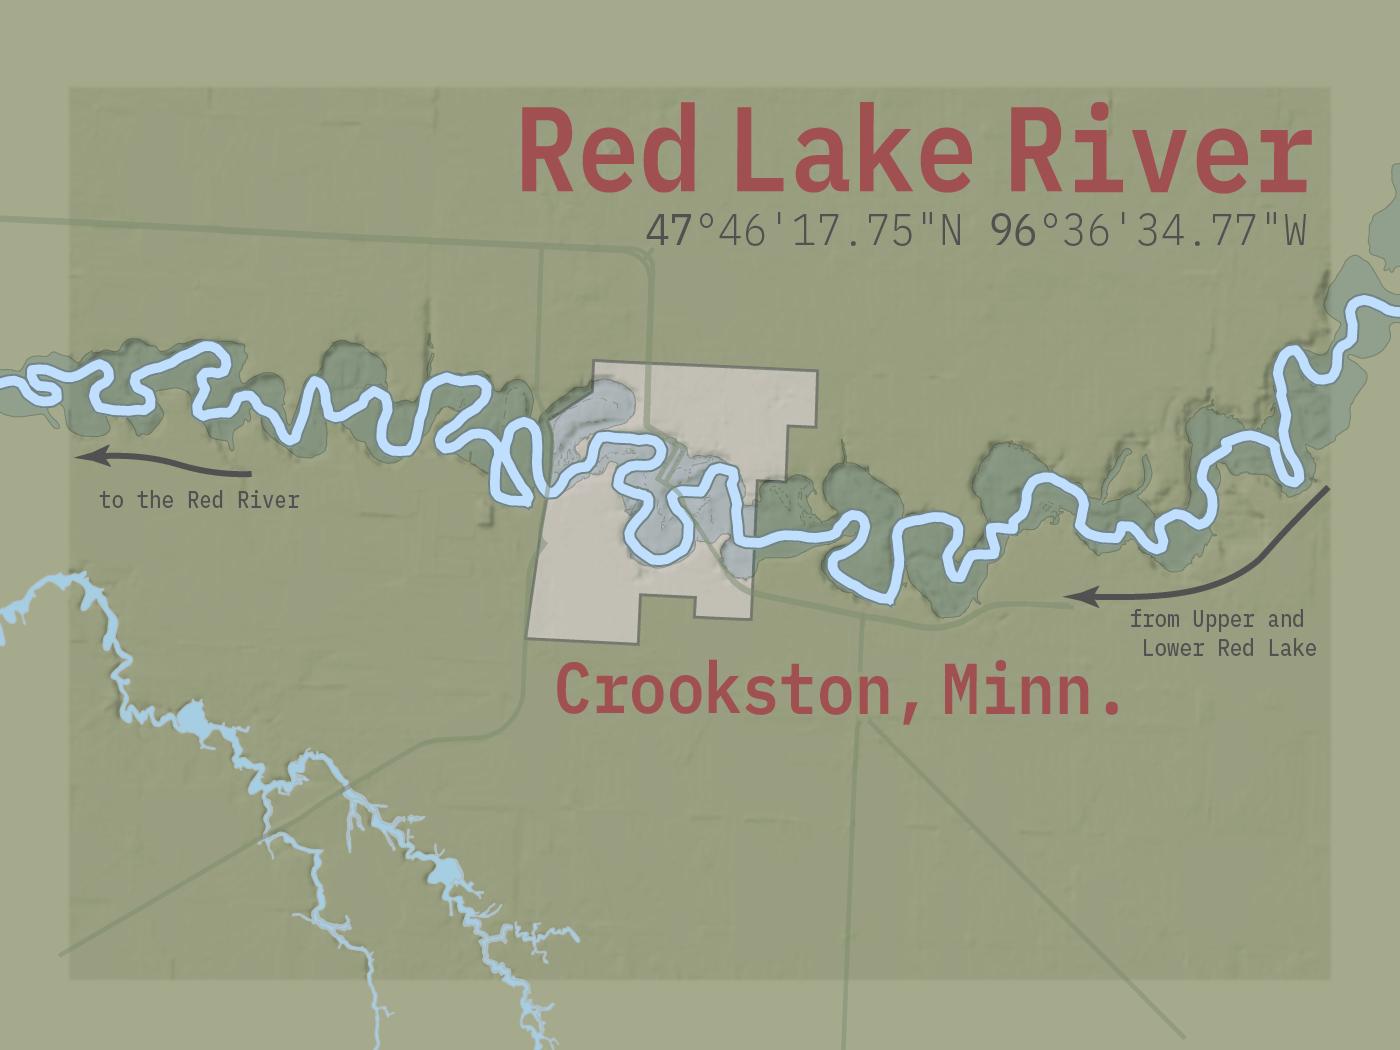 The Red Lake River winds through Crookston, Minn.